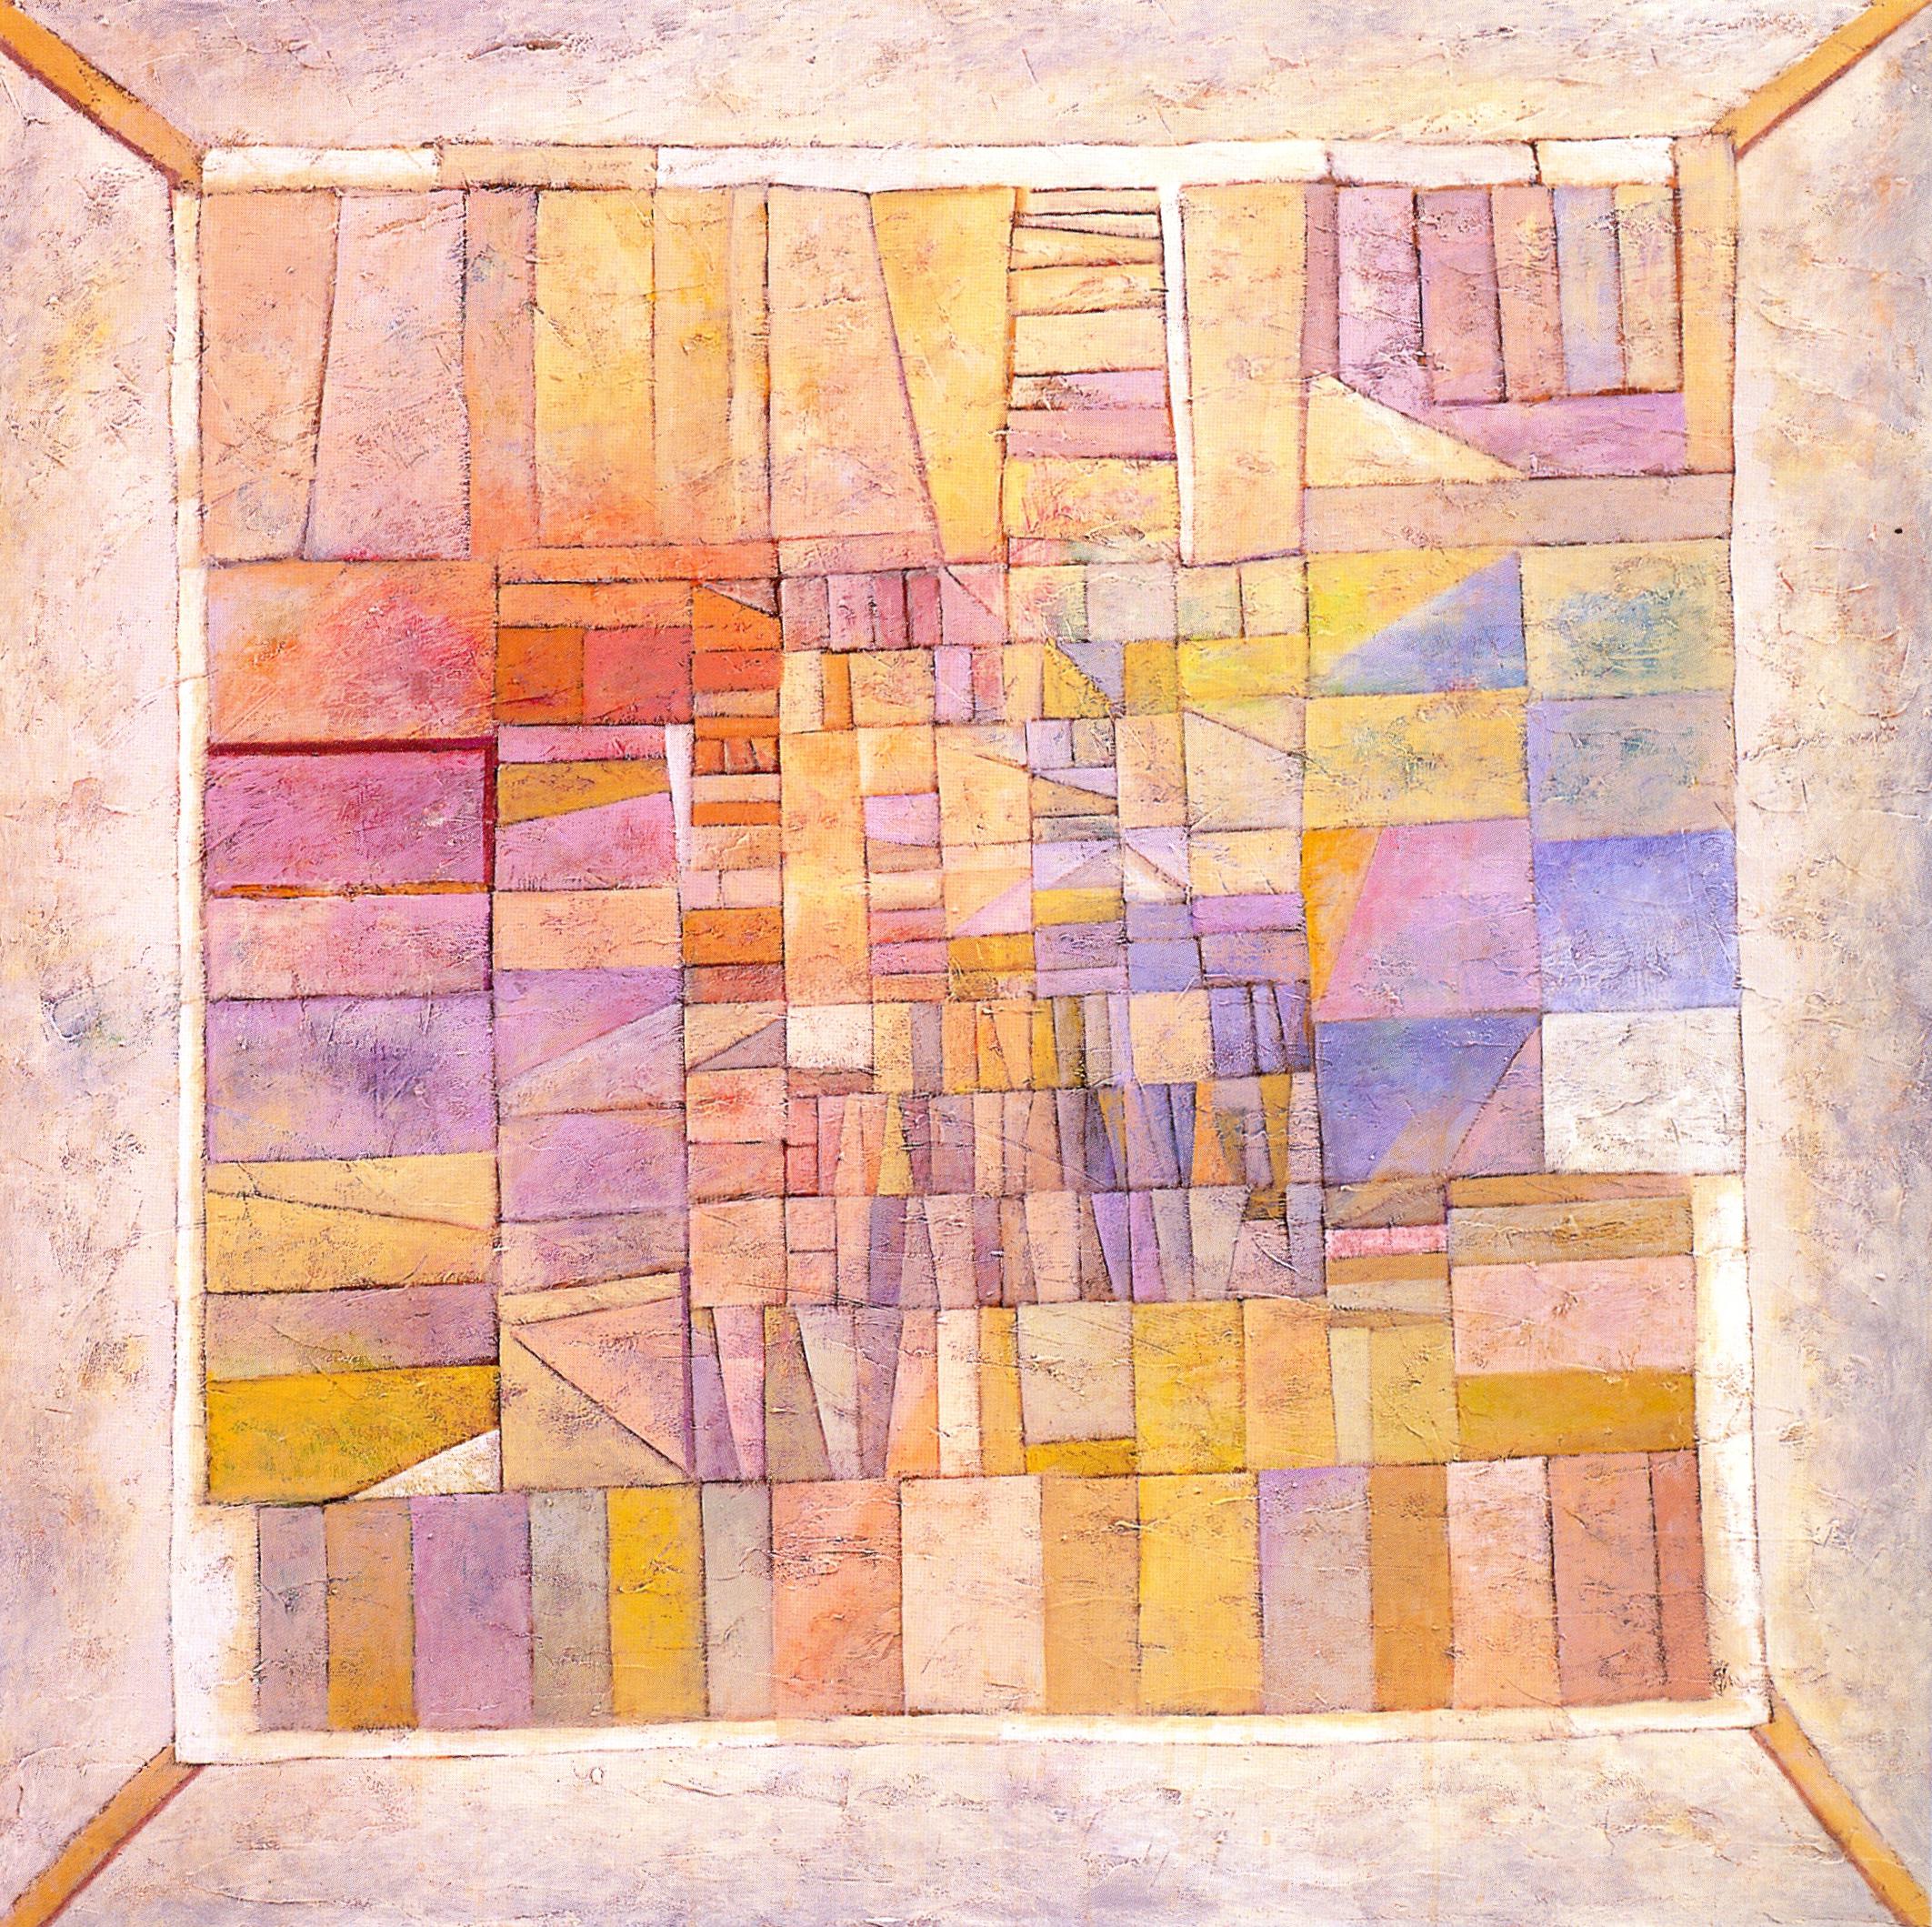 "Road Home #2 (Pojagi #1),   2002, Acrylic on canvas, 48"" x 48"""